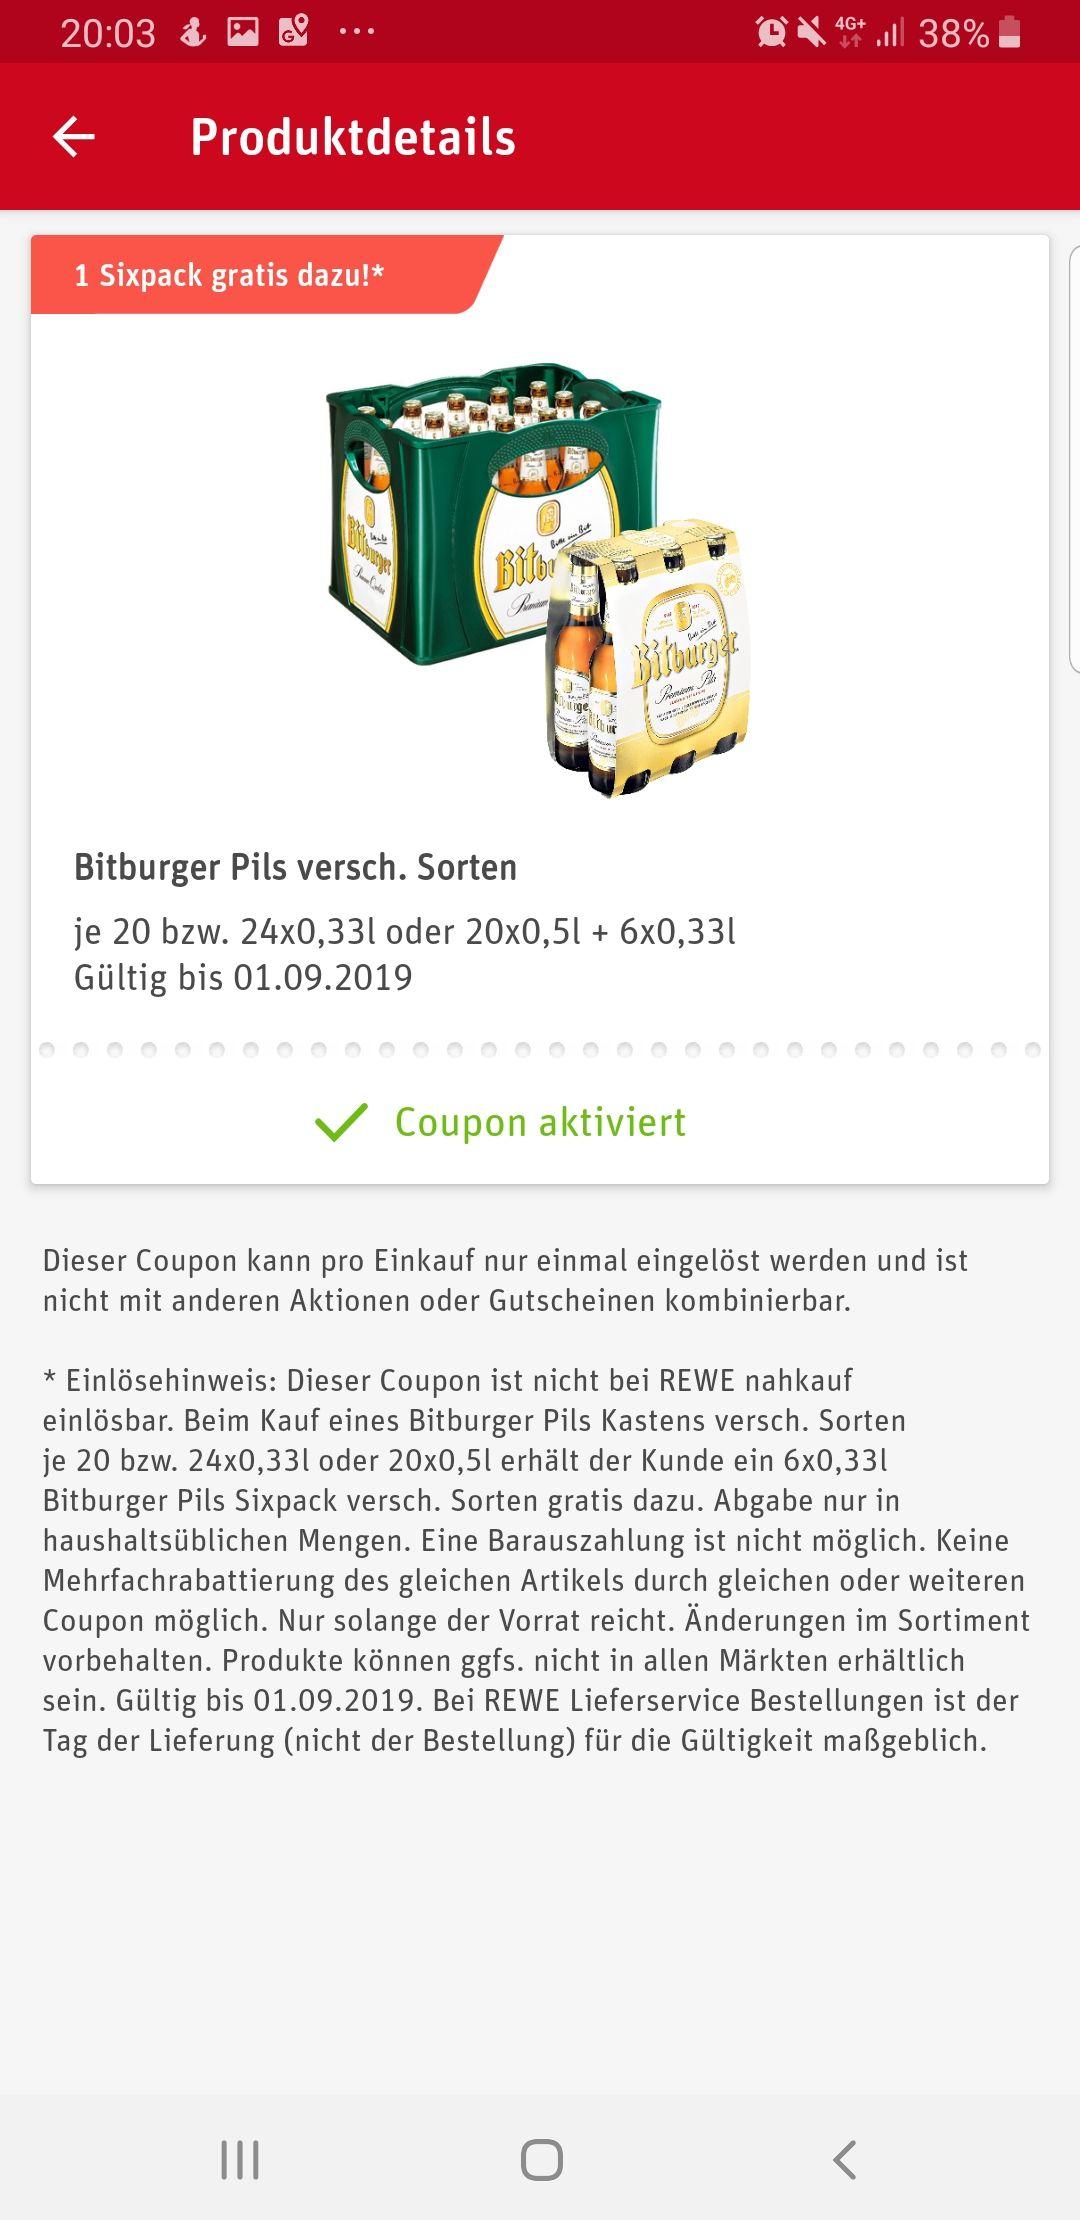 Rewe - 26x0,33L Bitburger für eff. 4,99€ - Payback Couponfehler?